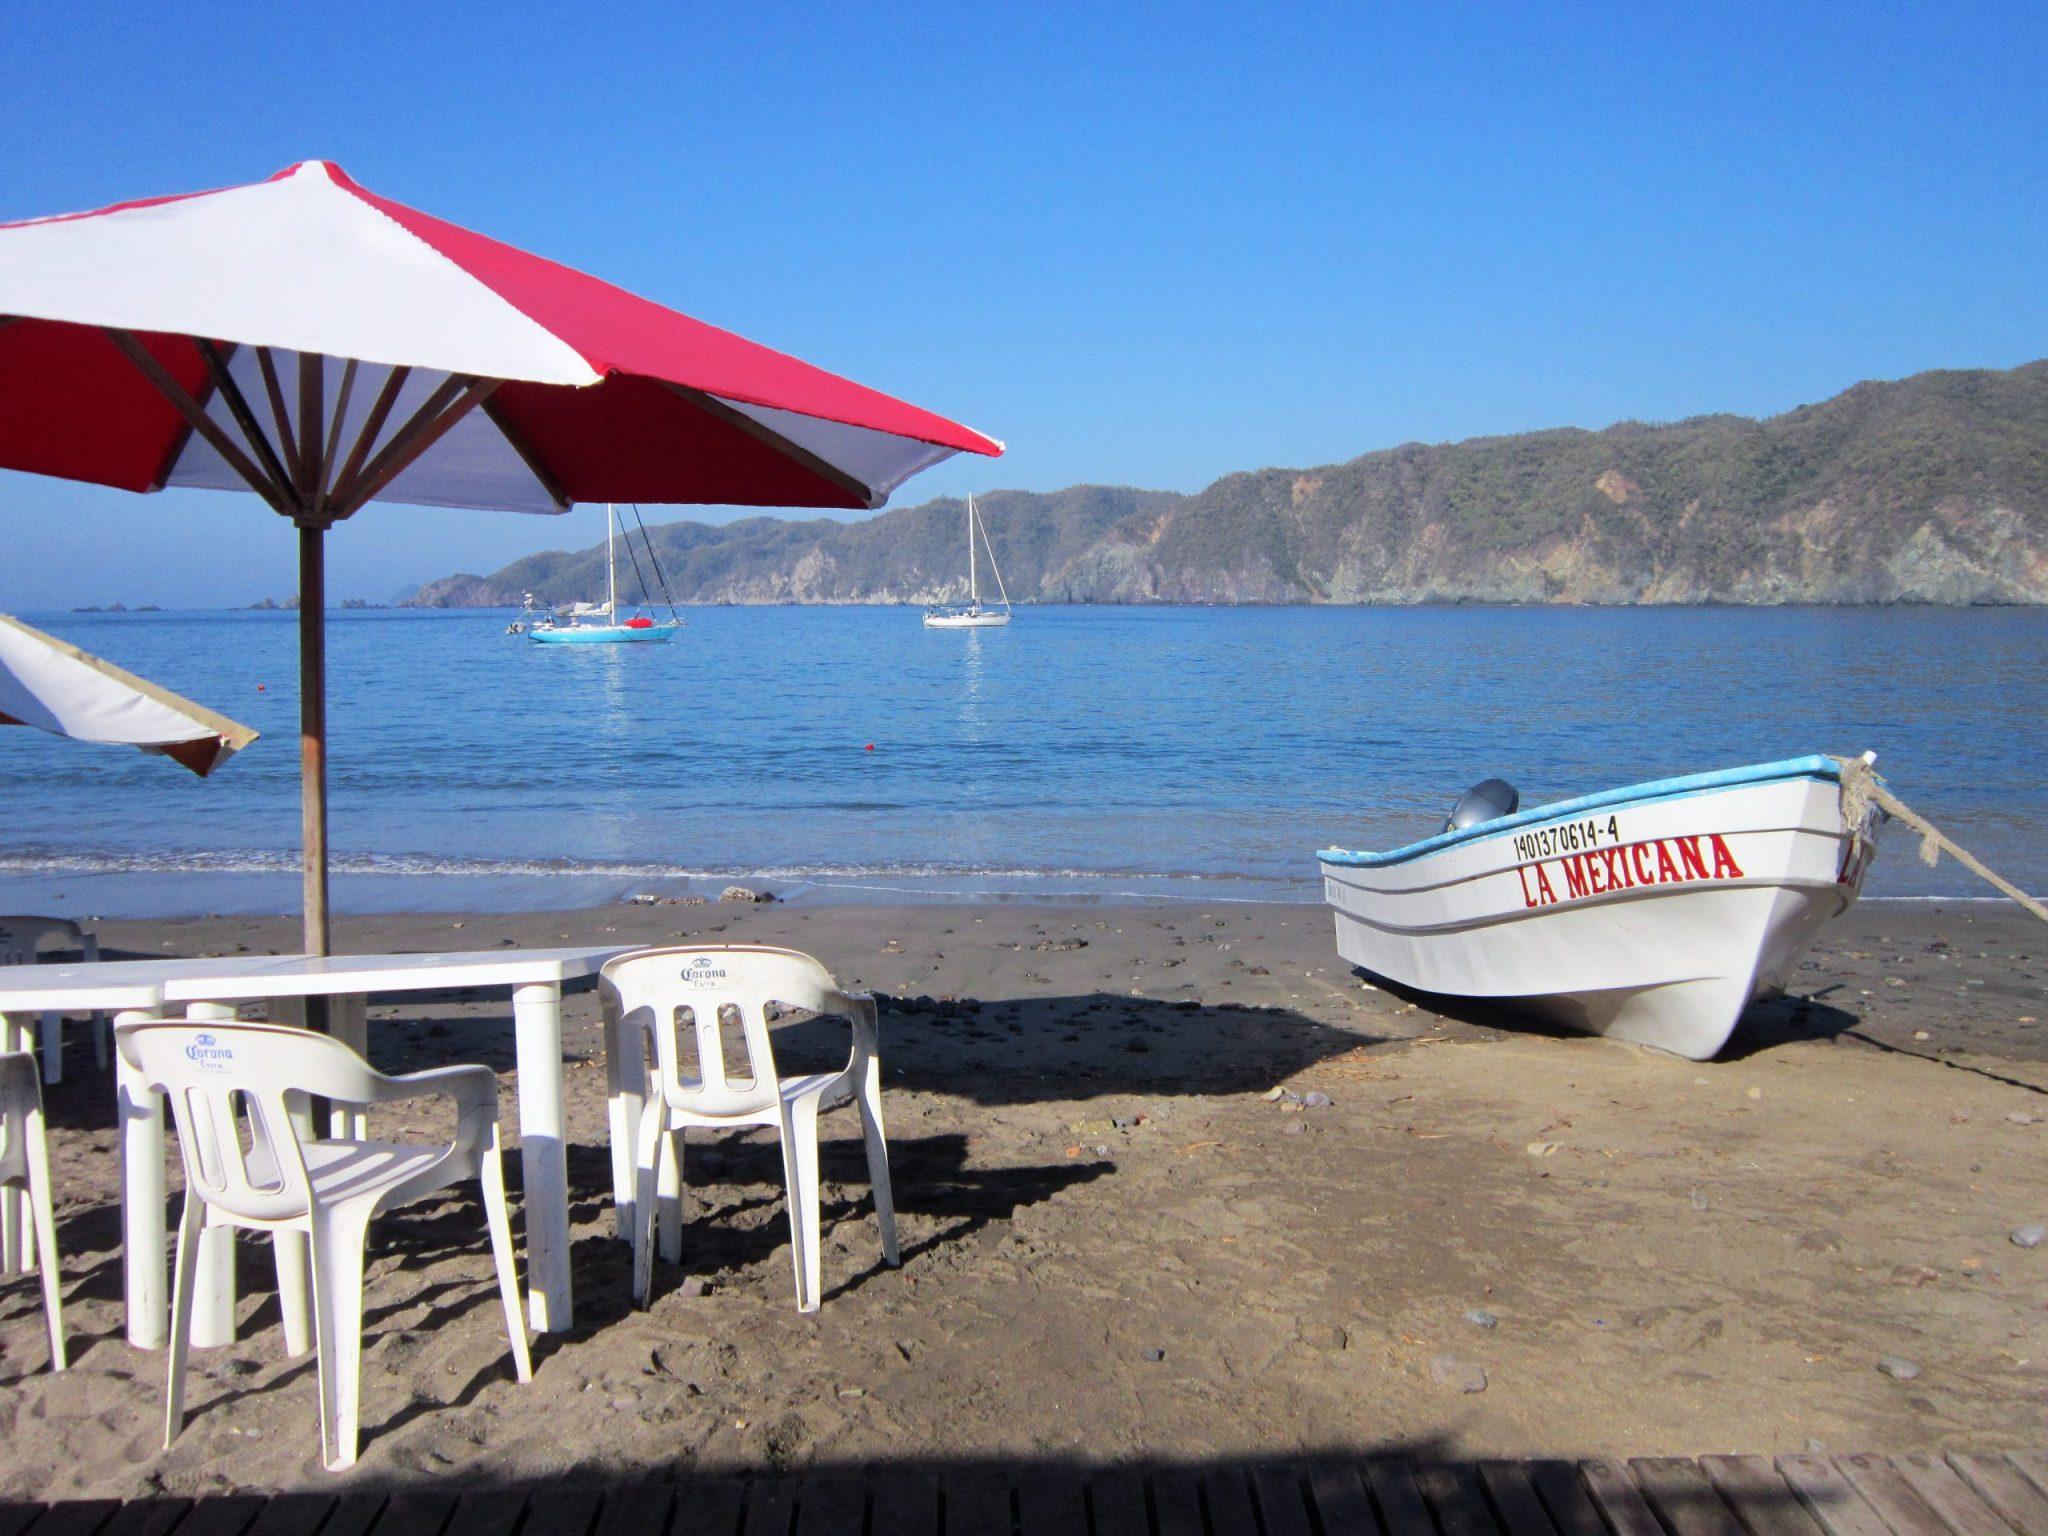 The beach in Cuastecomate